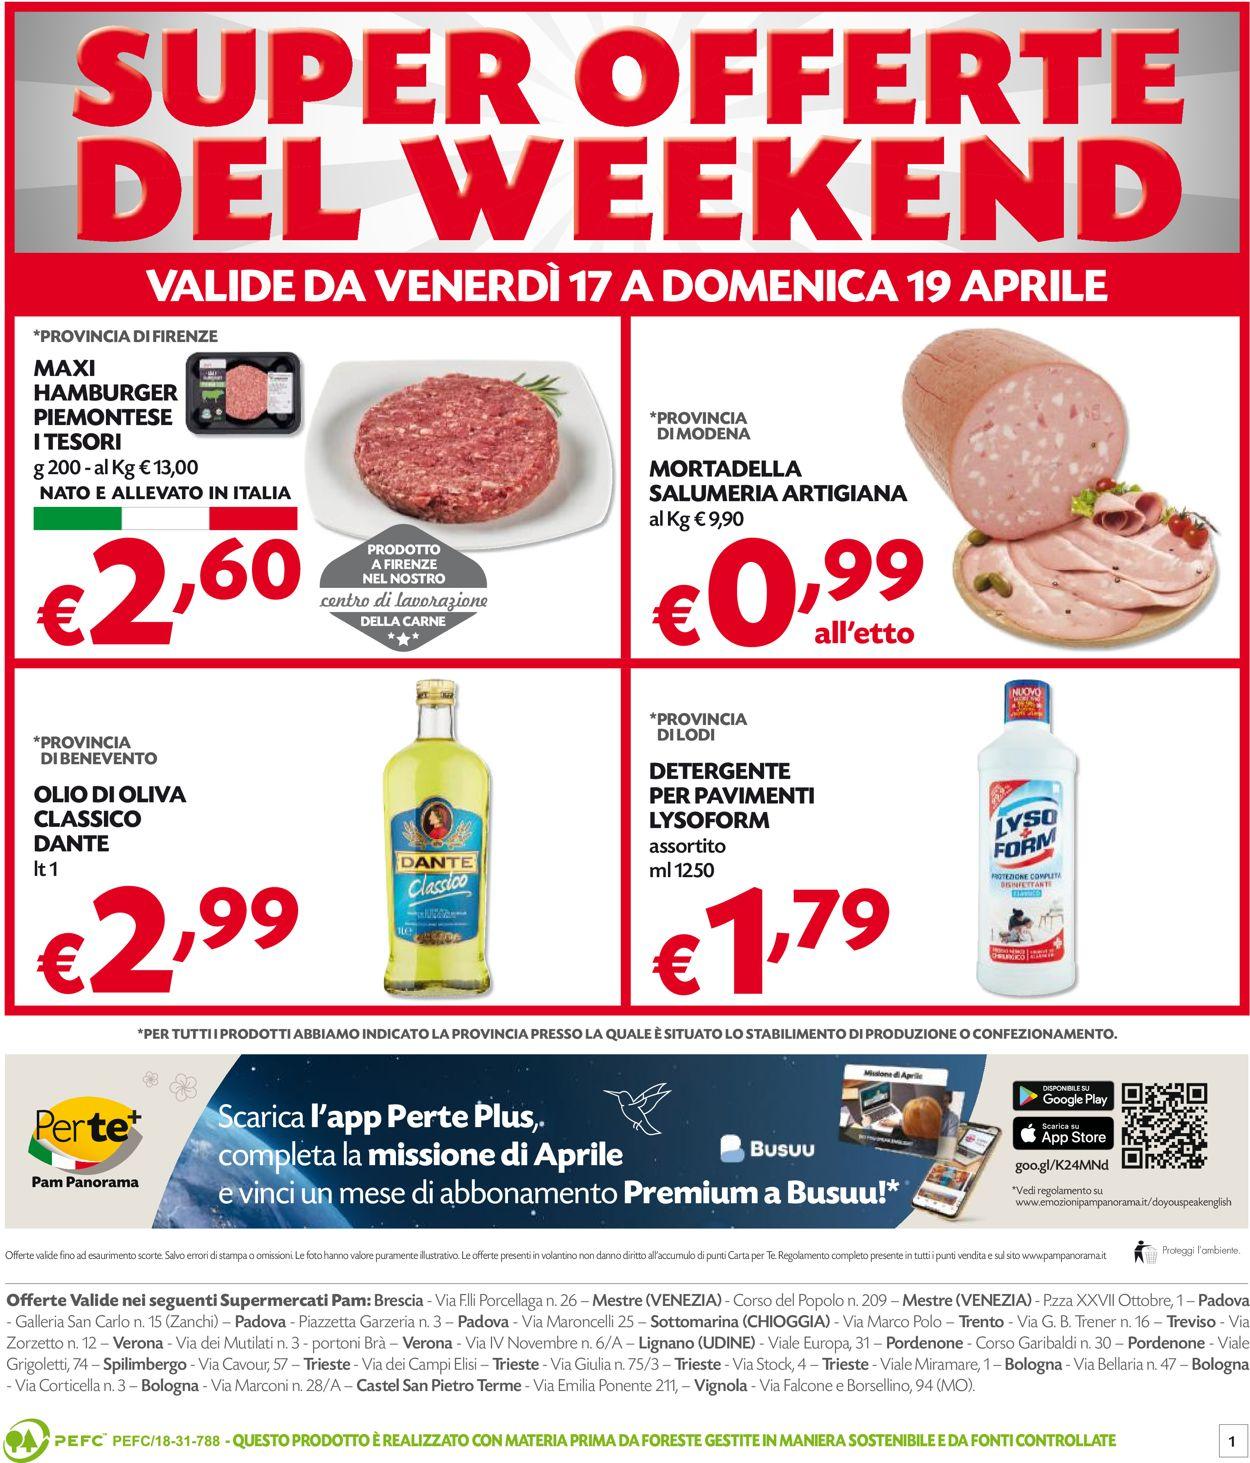 Volantino Pam Panorama - Offerte 13/04-19/04/2020 (Pagina 12)